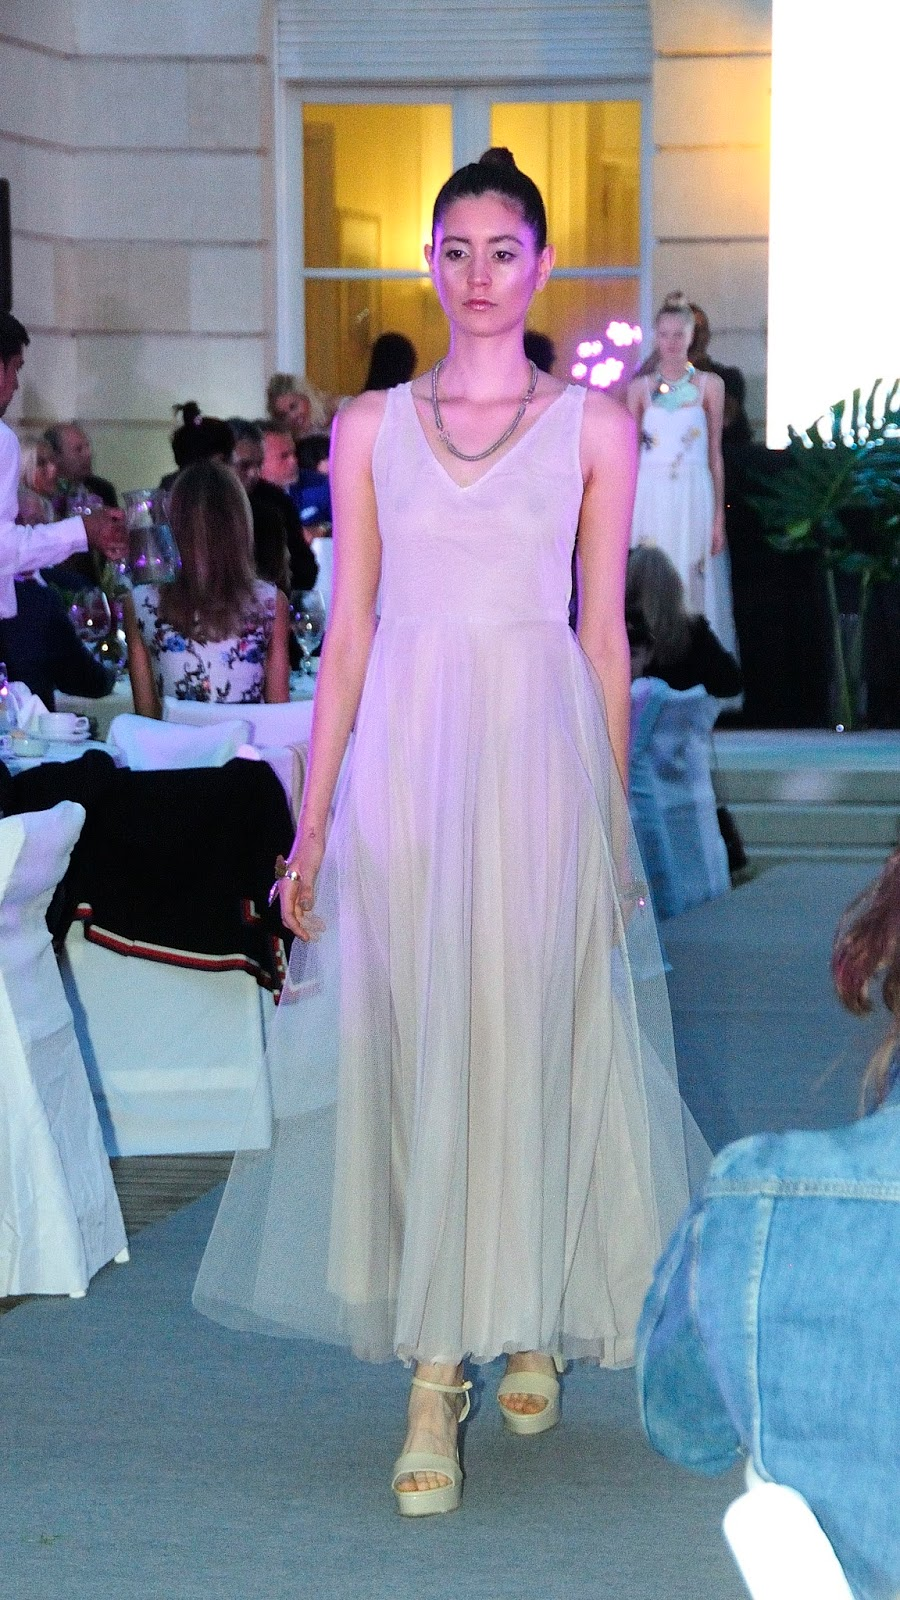 Fantástico Vestido De Novia Robin Scherbatsky Viñeta - Ideas de ...